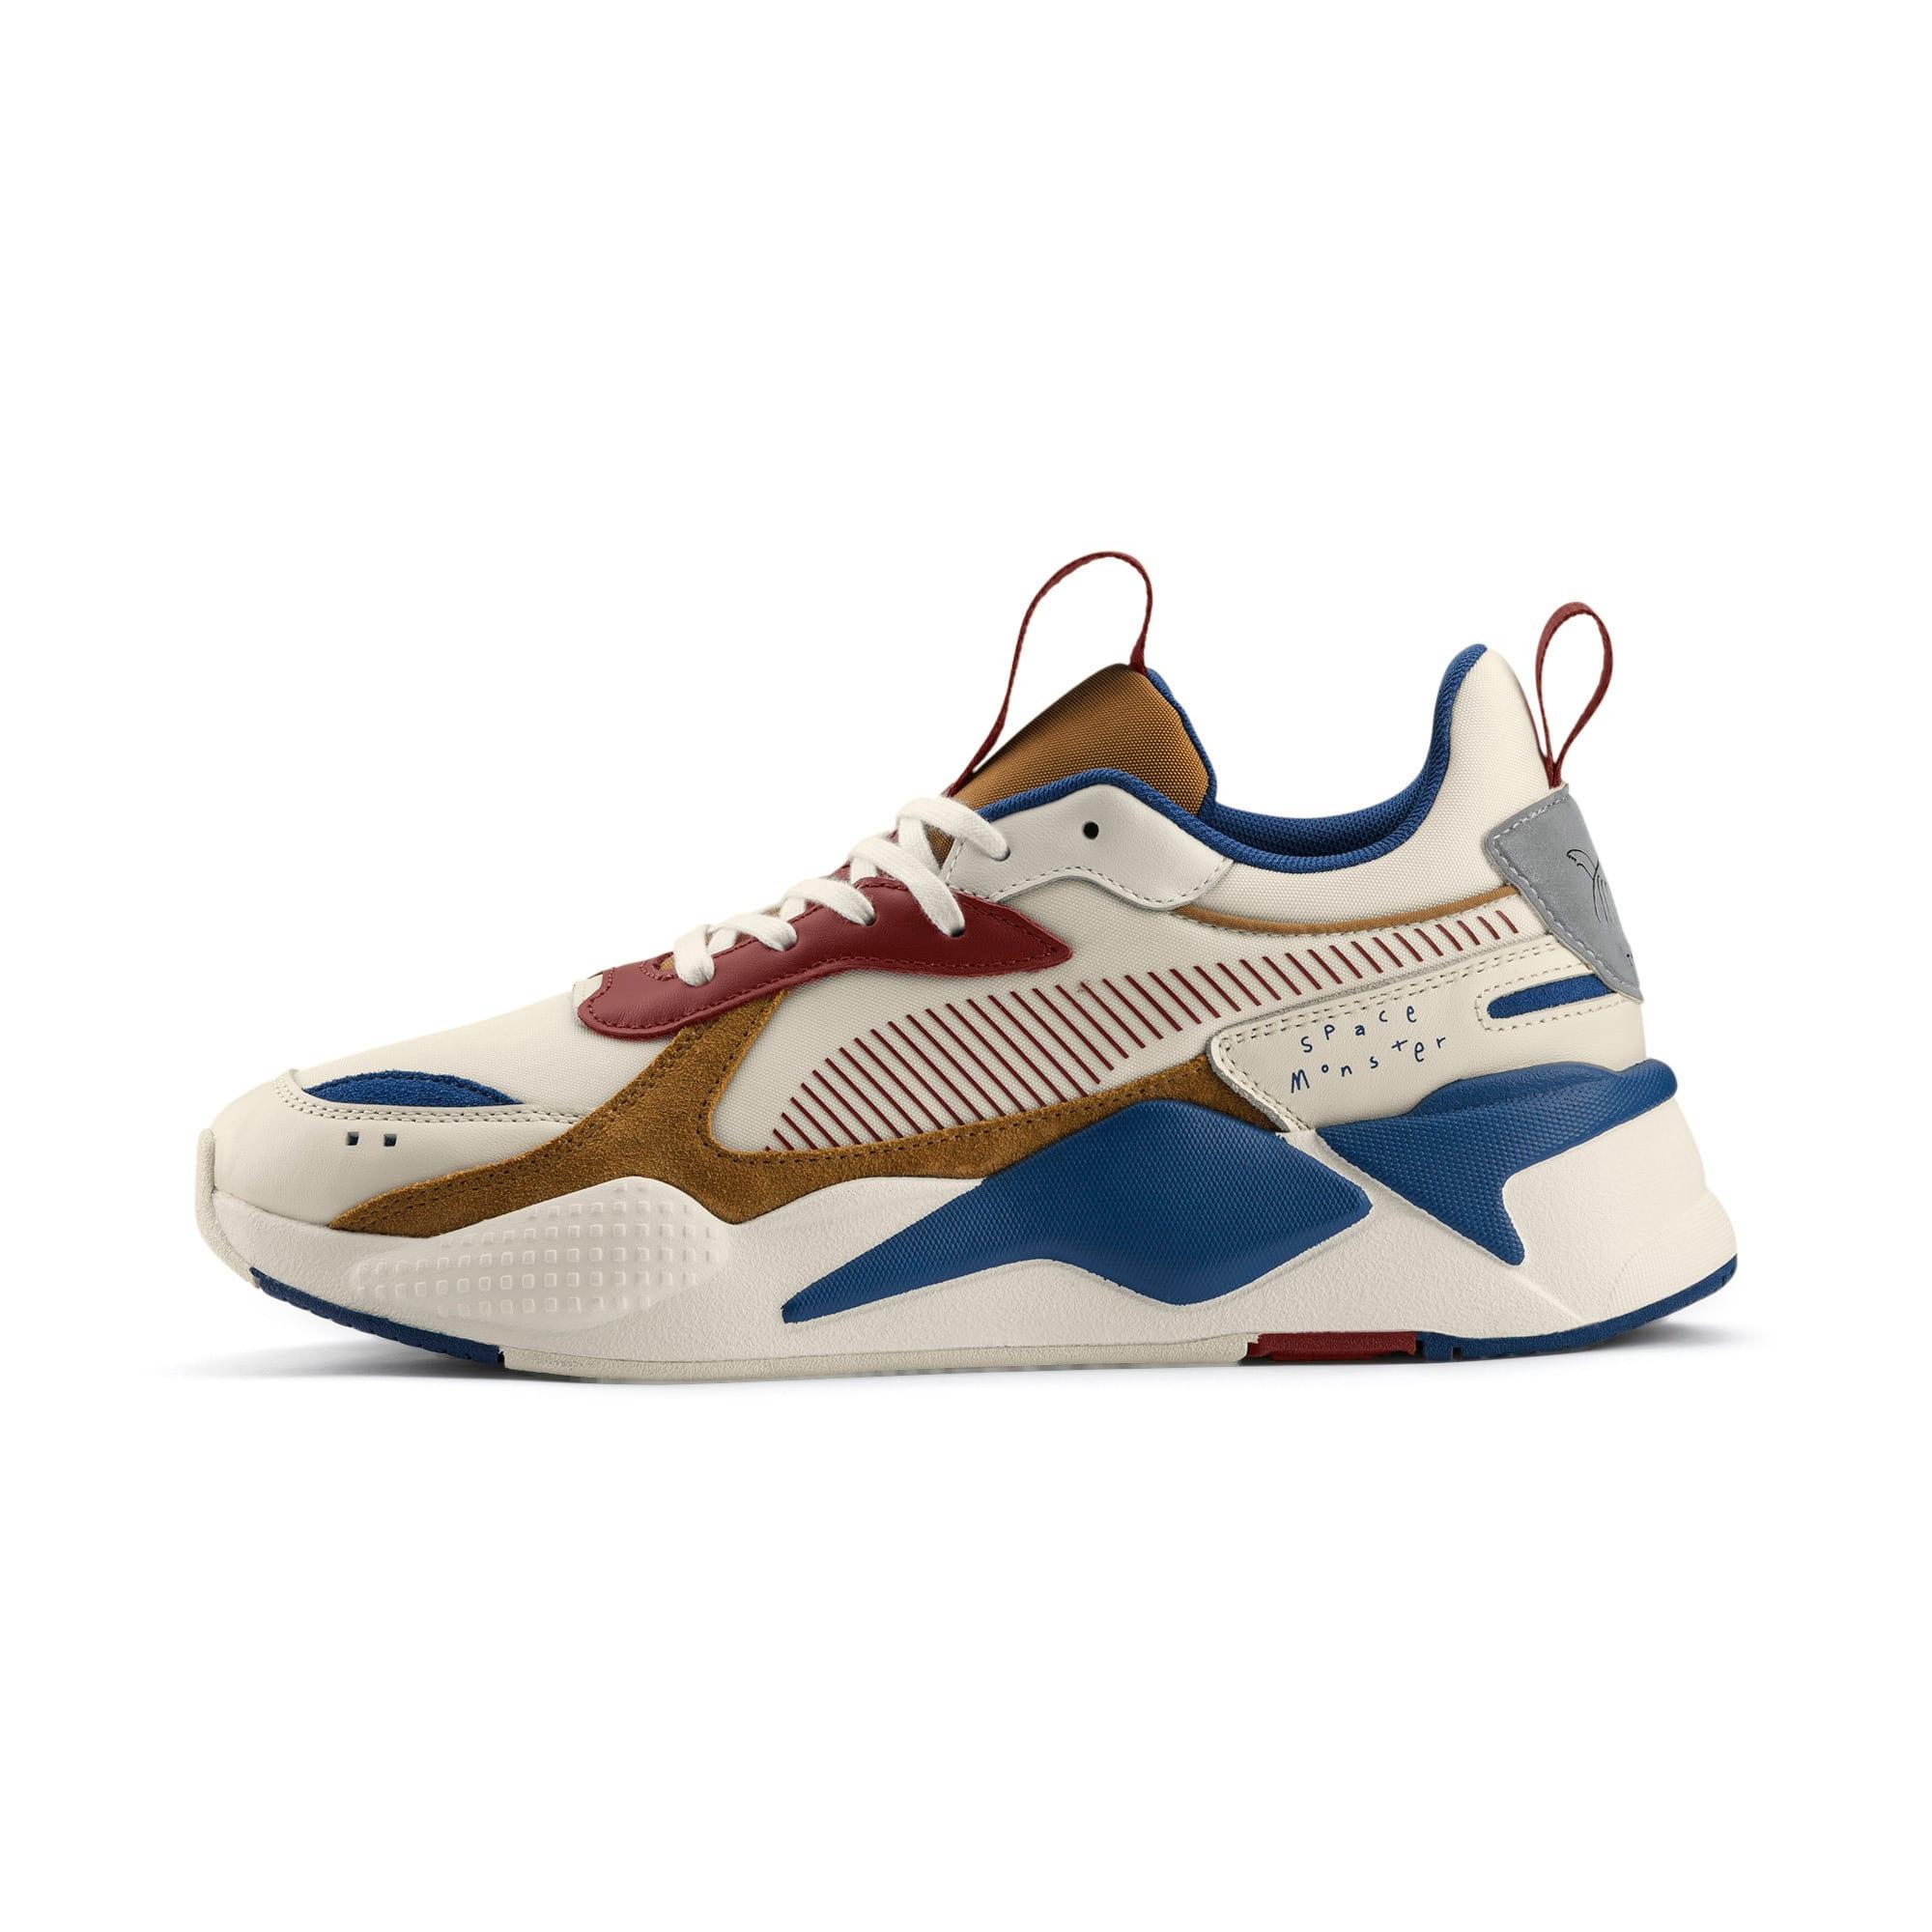 Thumbnail 1 of PUMA x TYAKASHA RS-X Sneakers, Whisper White-Fired Brick, medium